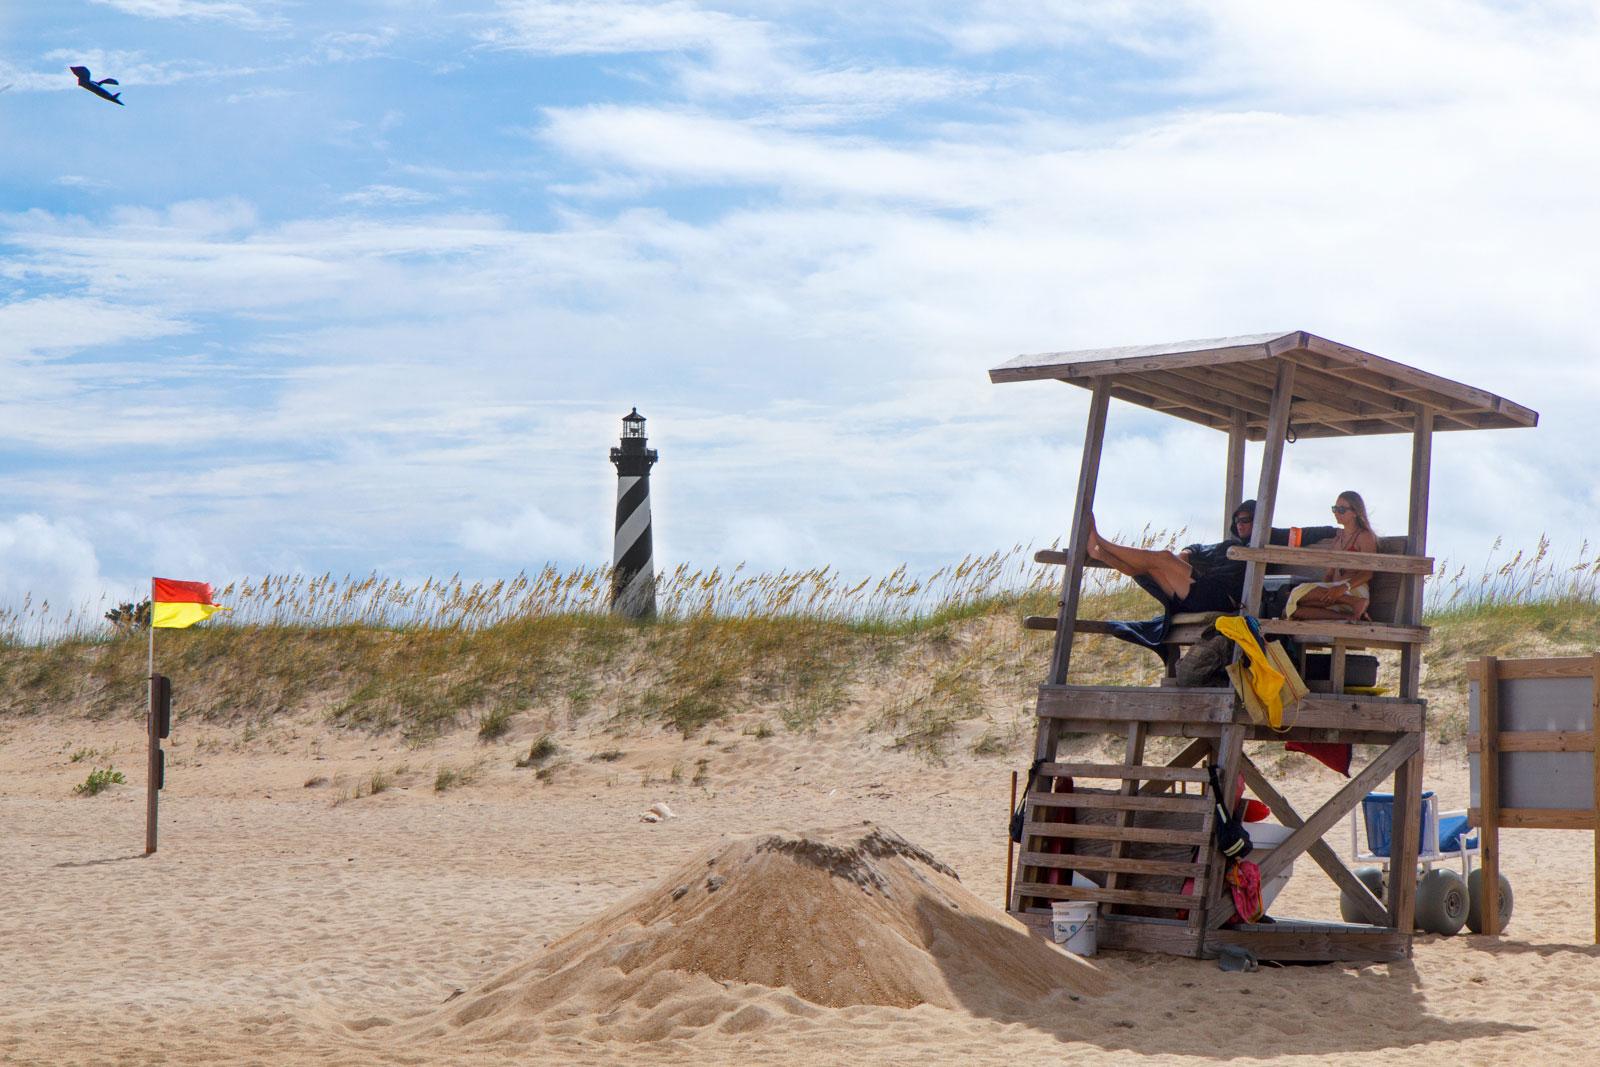 Car Rentals Charlotte Nc >> Cape Hatteras - Cape Hatteras National Seashore